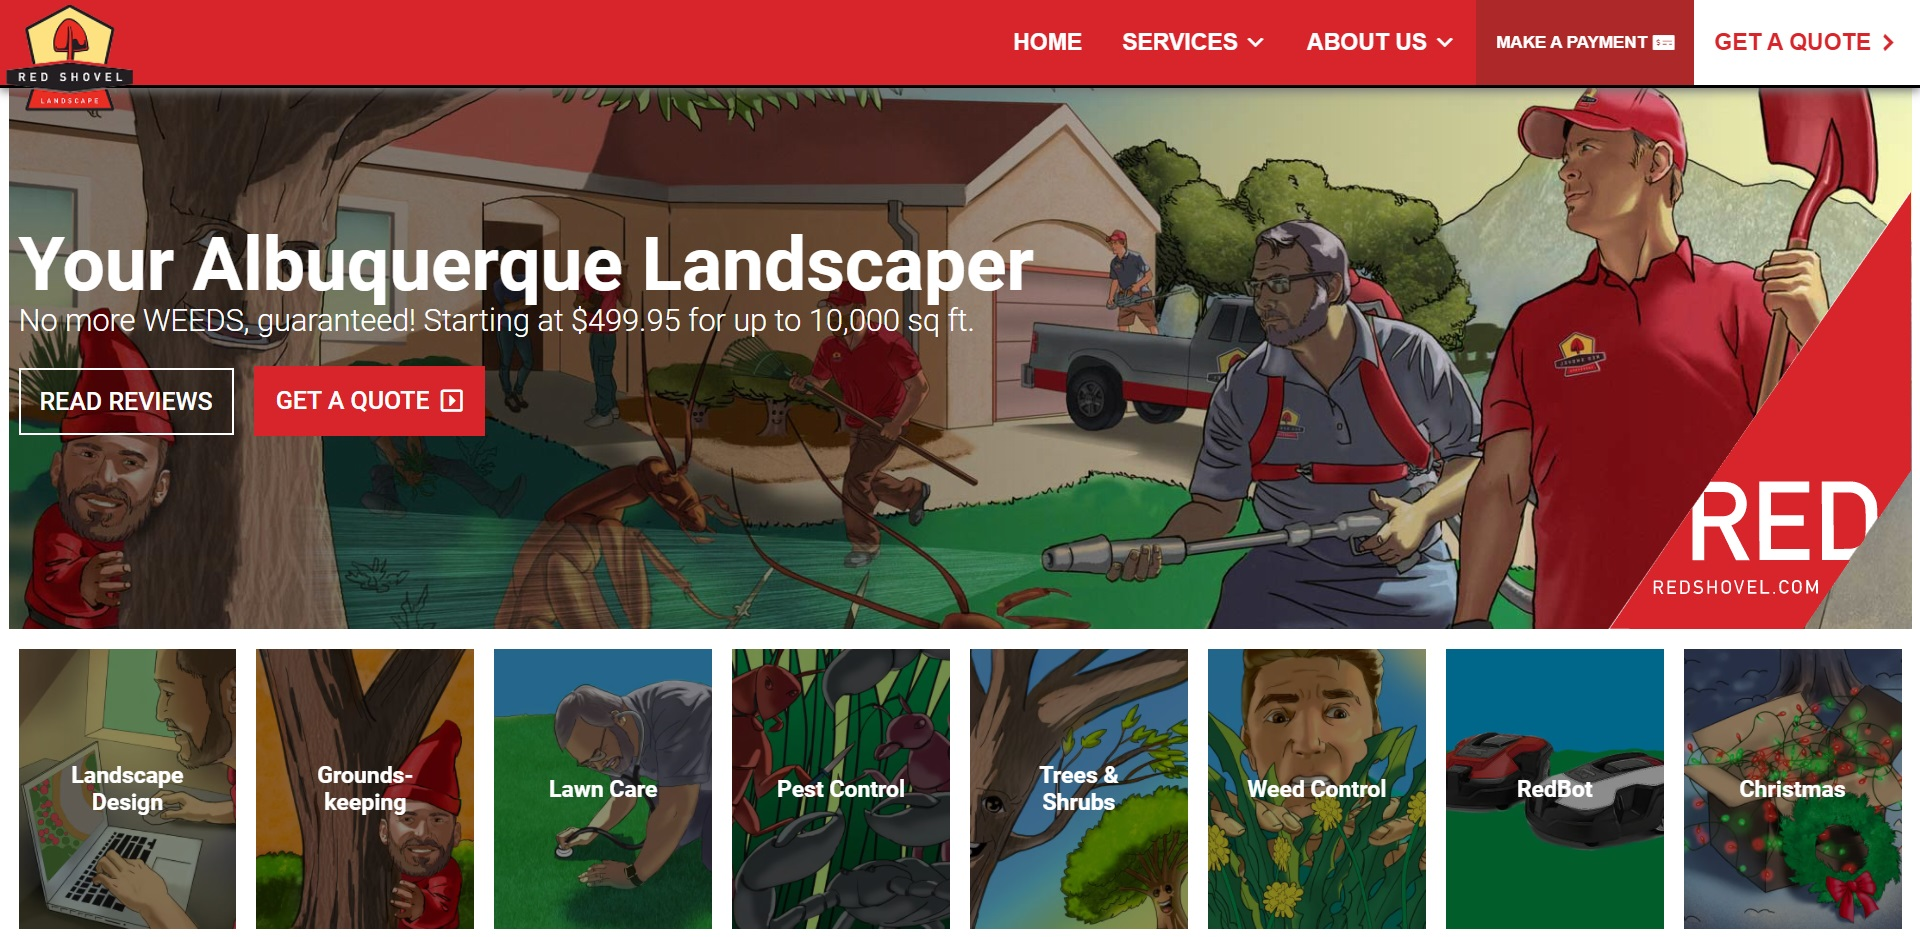 The Best Landscaping Companies in Albuquerque, NM